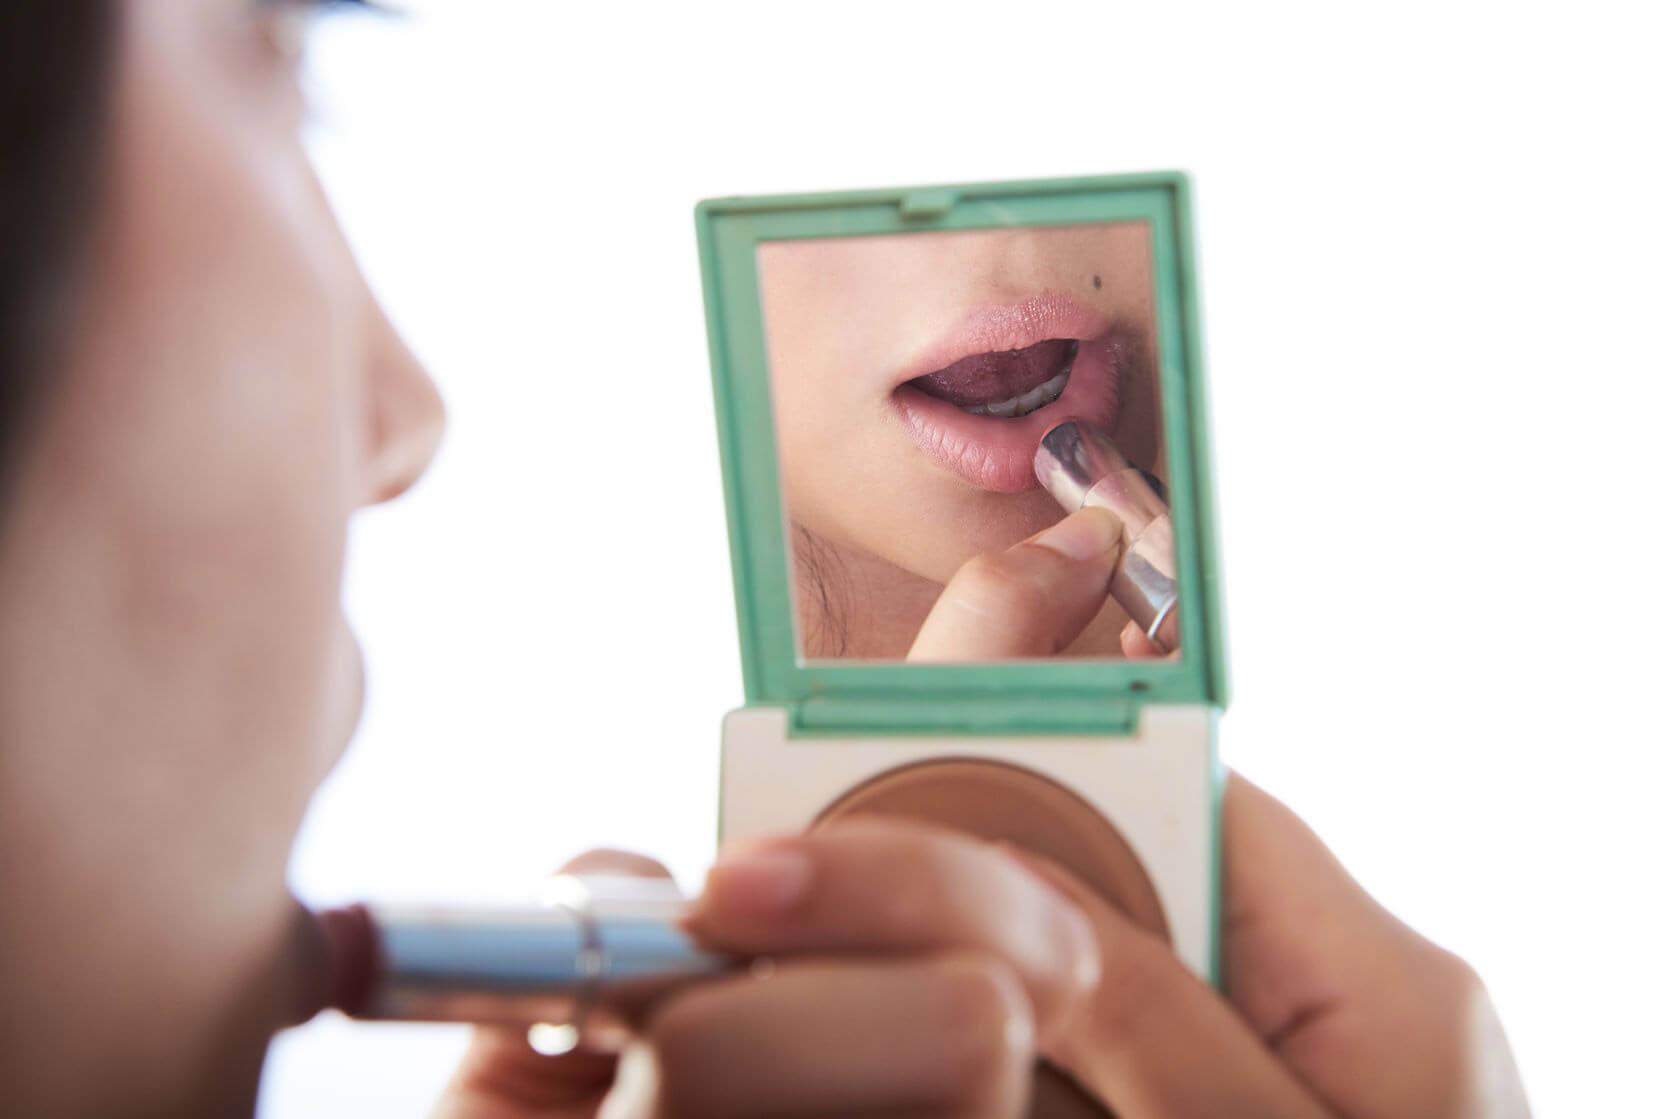 Webinar Recap: Avon Taps Into The Latin American Cosmetic Consumer | FocusVision